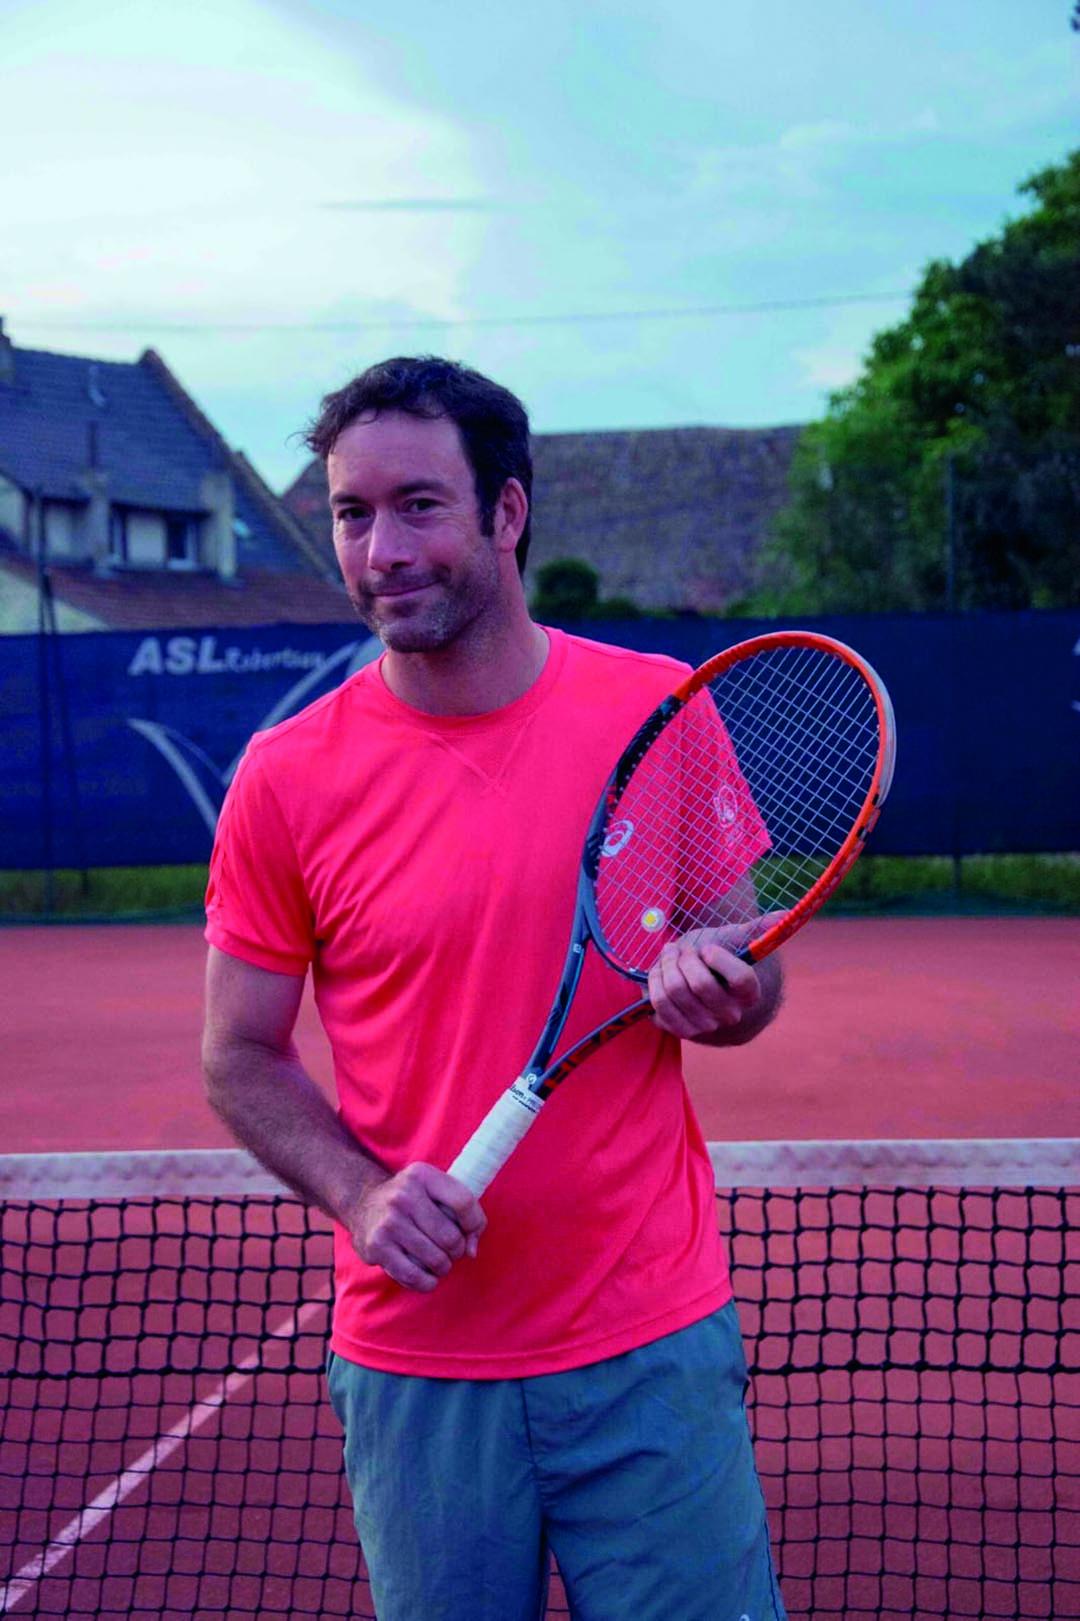 asl-tennis-1